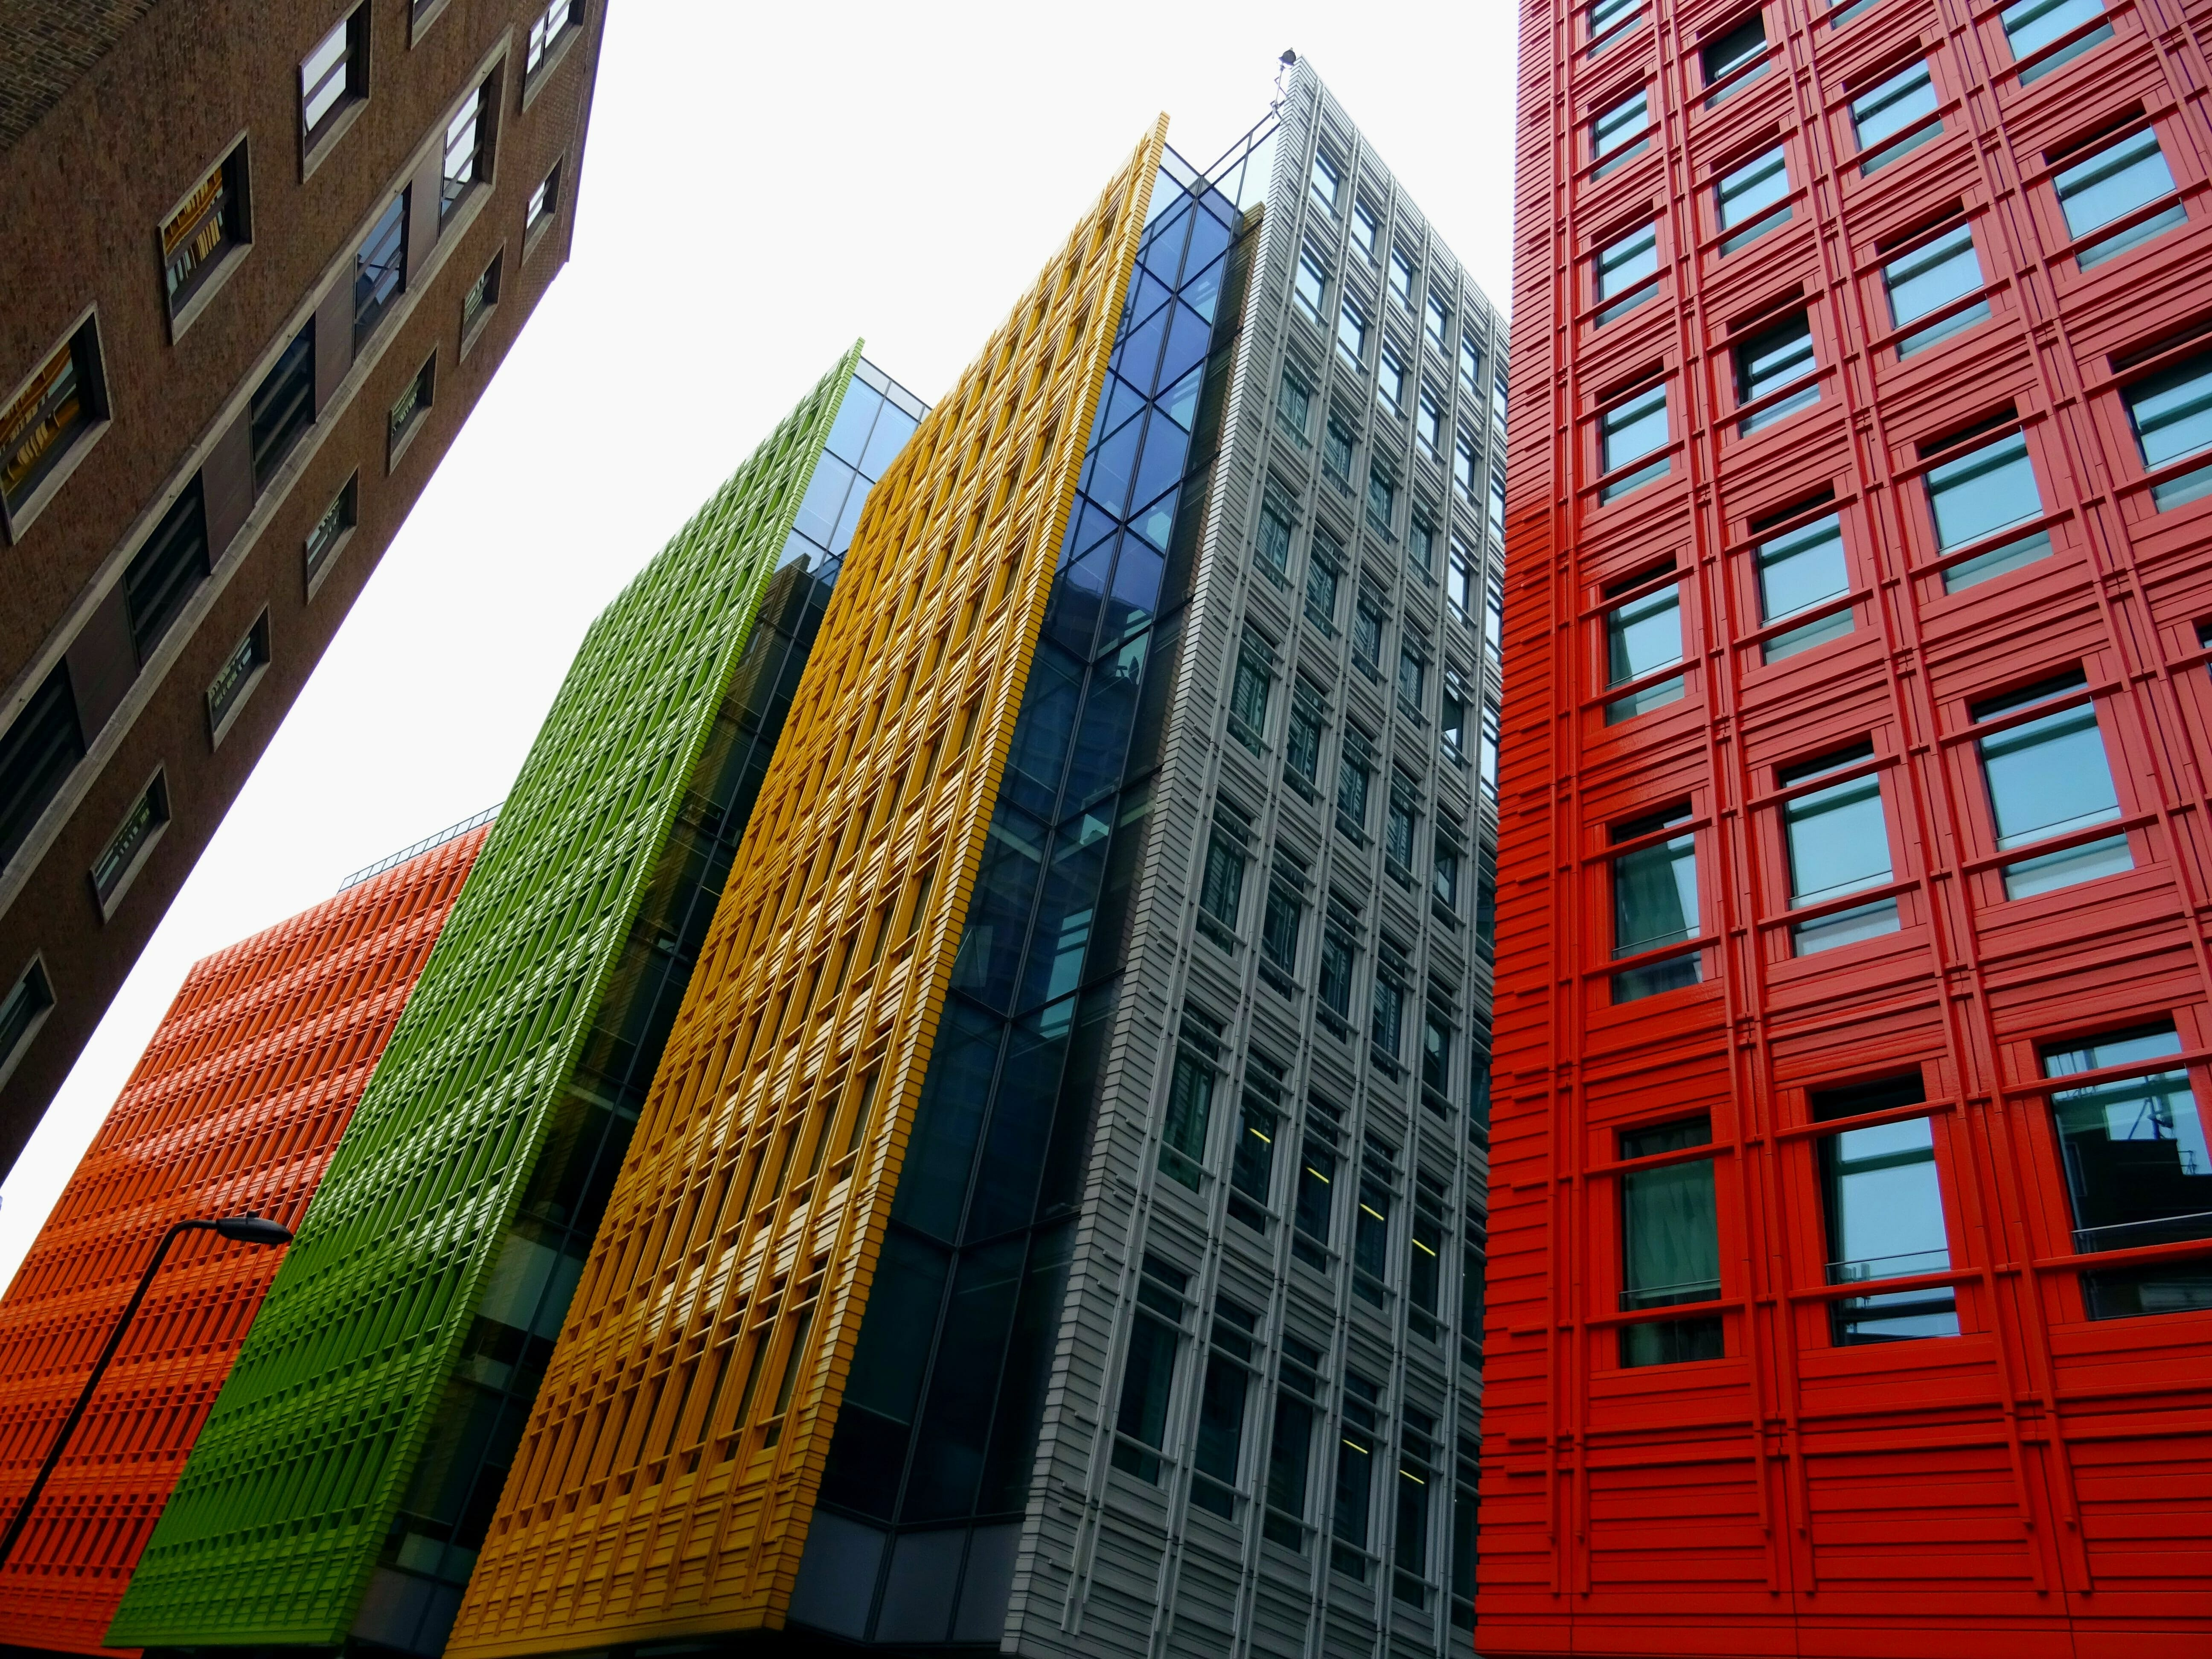 Colourful apartment buildings